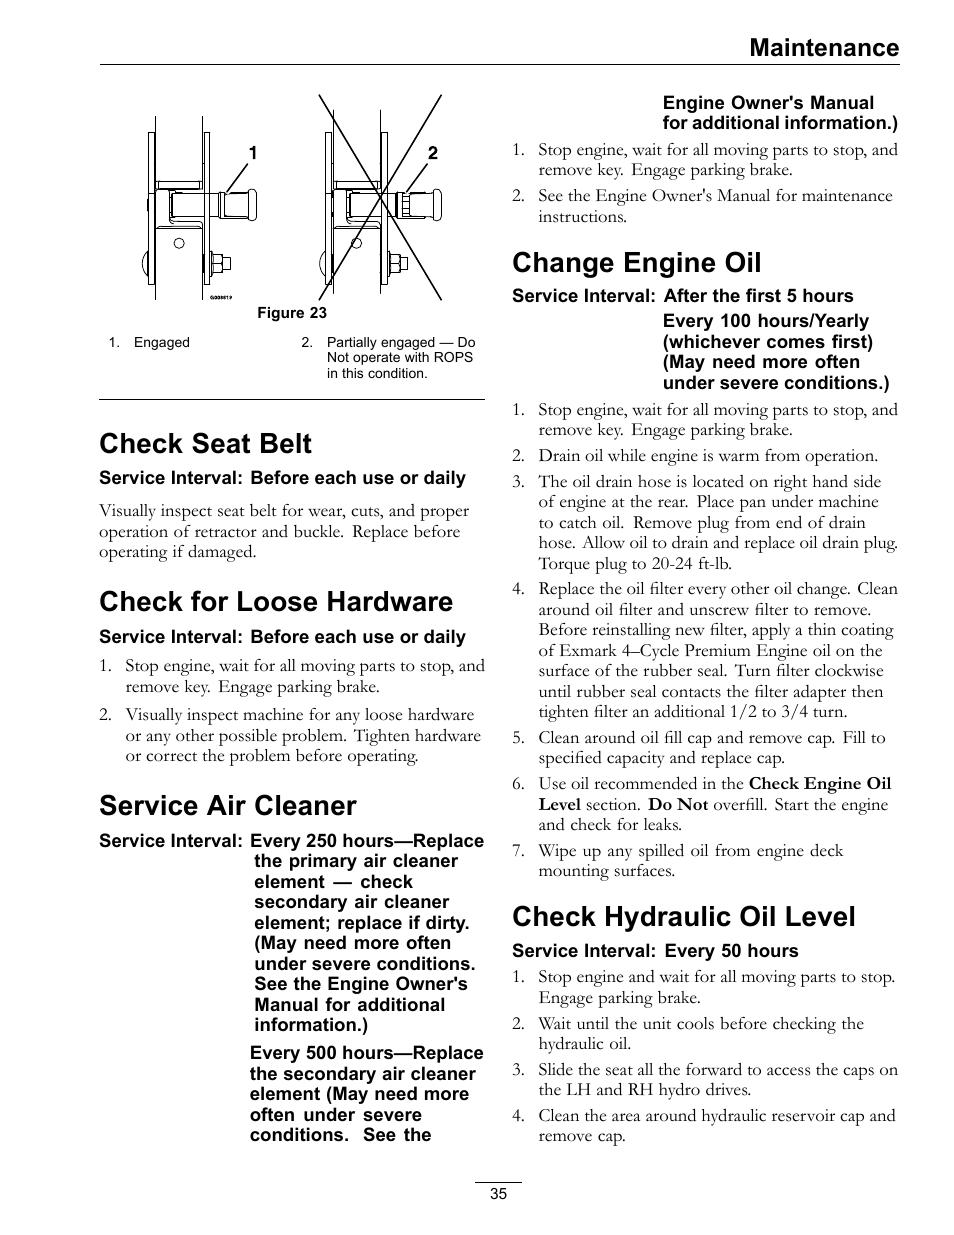 check seat belt check for loose hardware service air cleaner rh manualsdir com exmark lazer z s series owners manual exmark lazer z owners manual